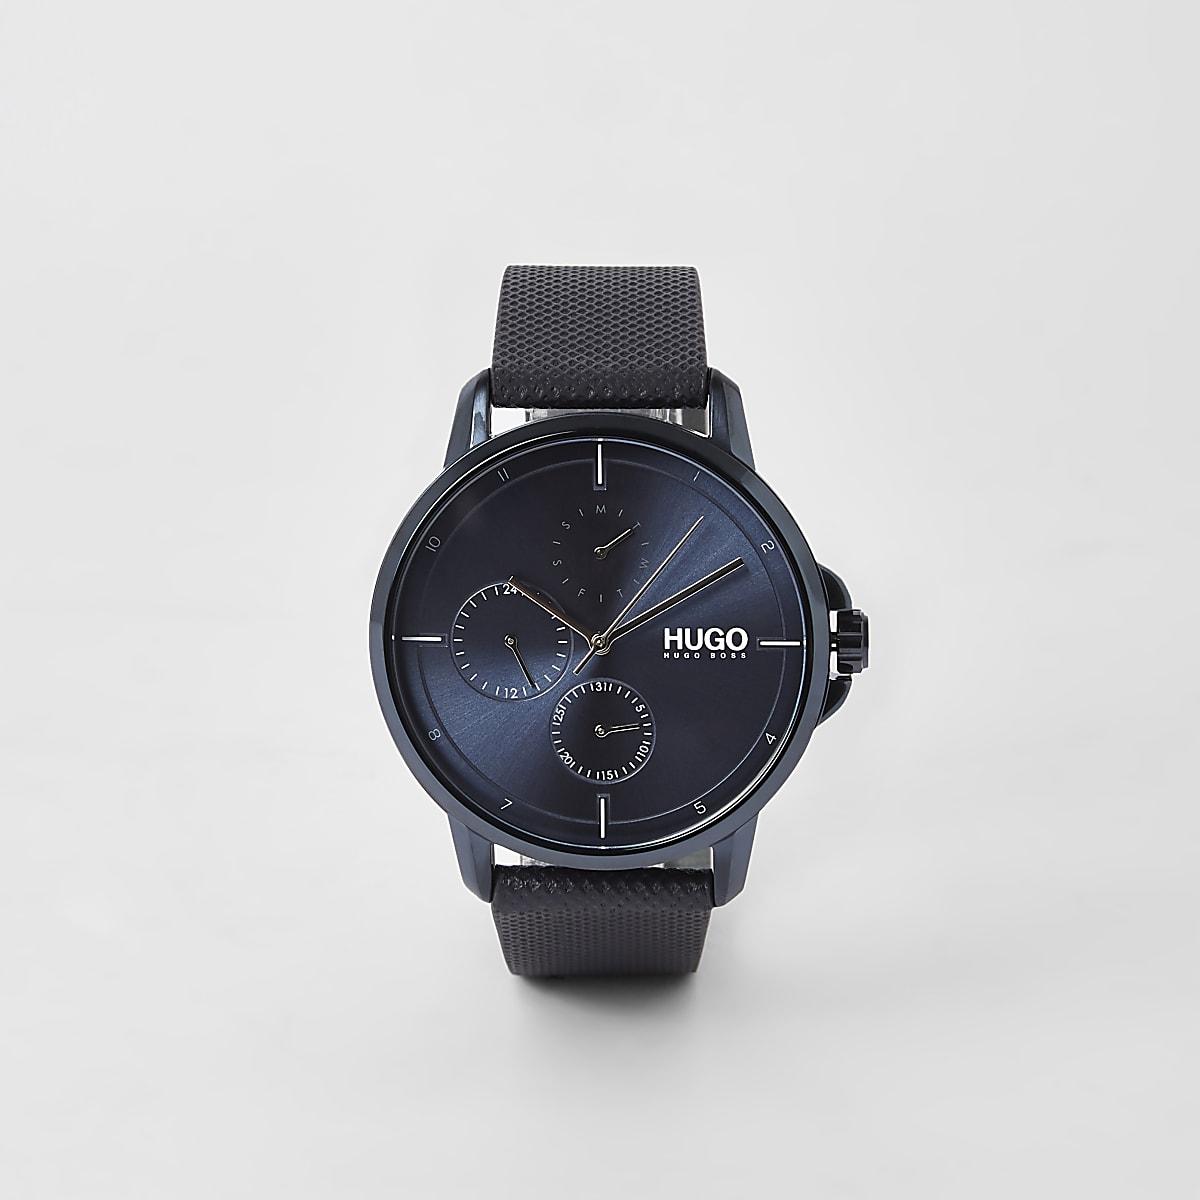 Hugo Focus blue 3 dials watch